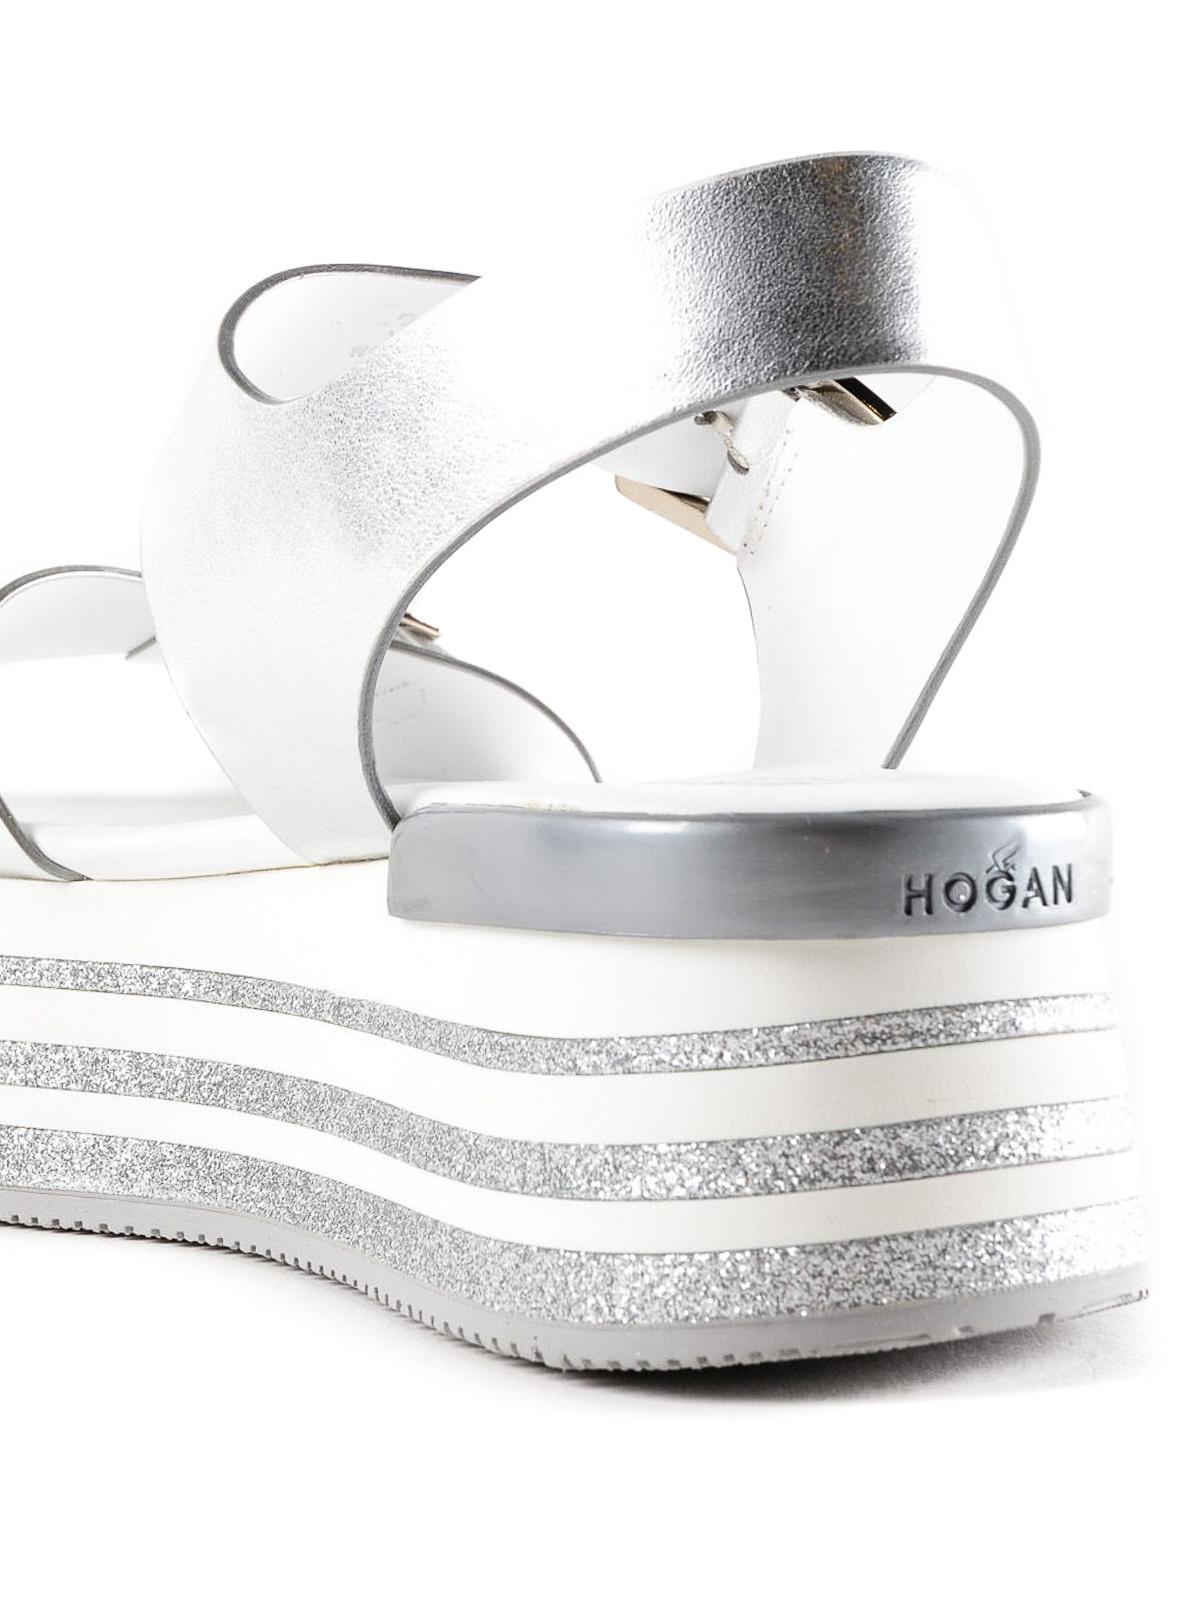 hogan maxi h222 glitter